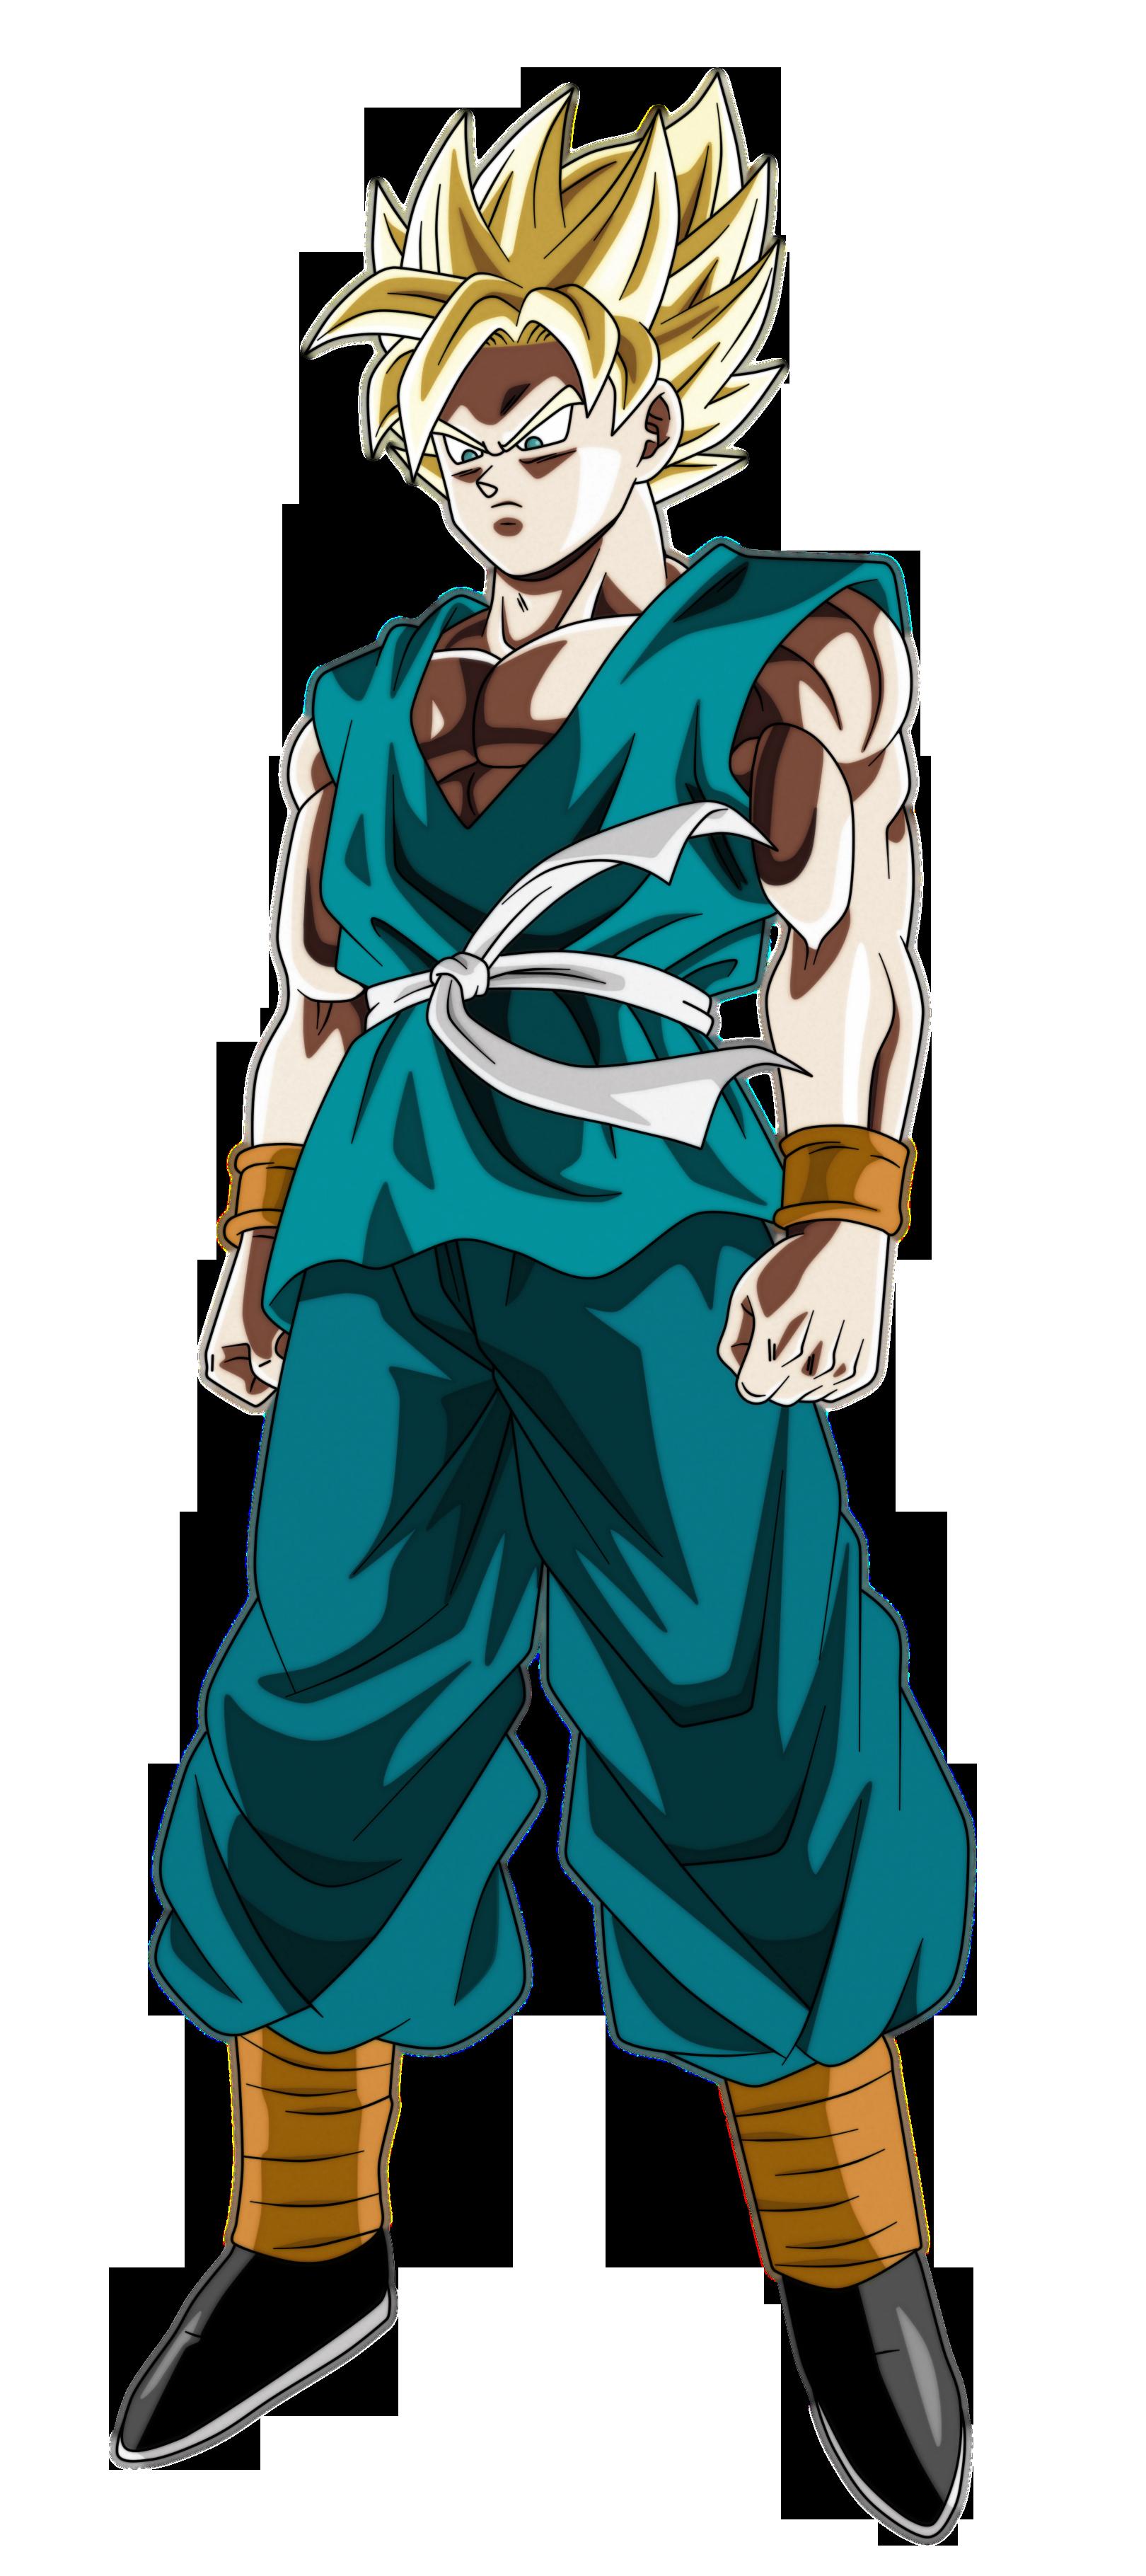 Goku Ssj End Of Z By Andrewdb13 On Deviantart Goku Super Saiyan God Goku Dragon Ball Art